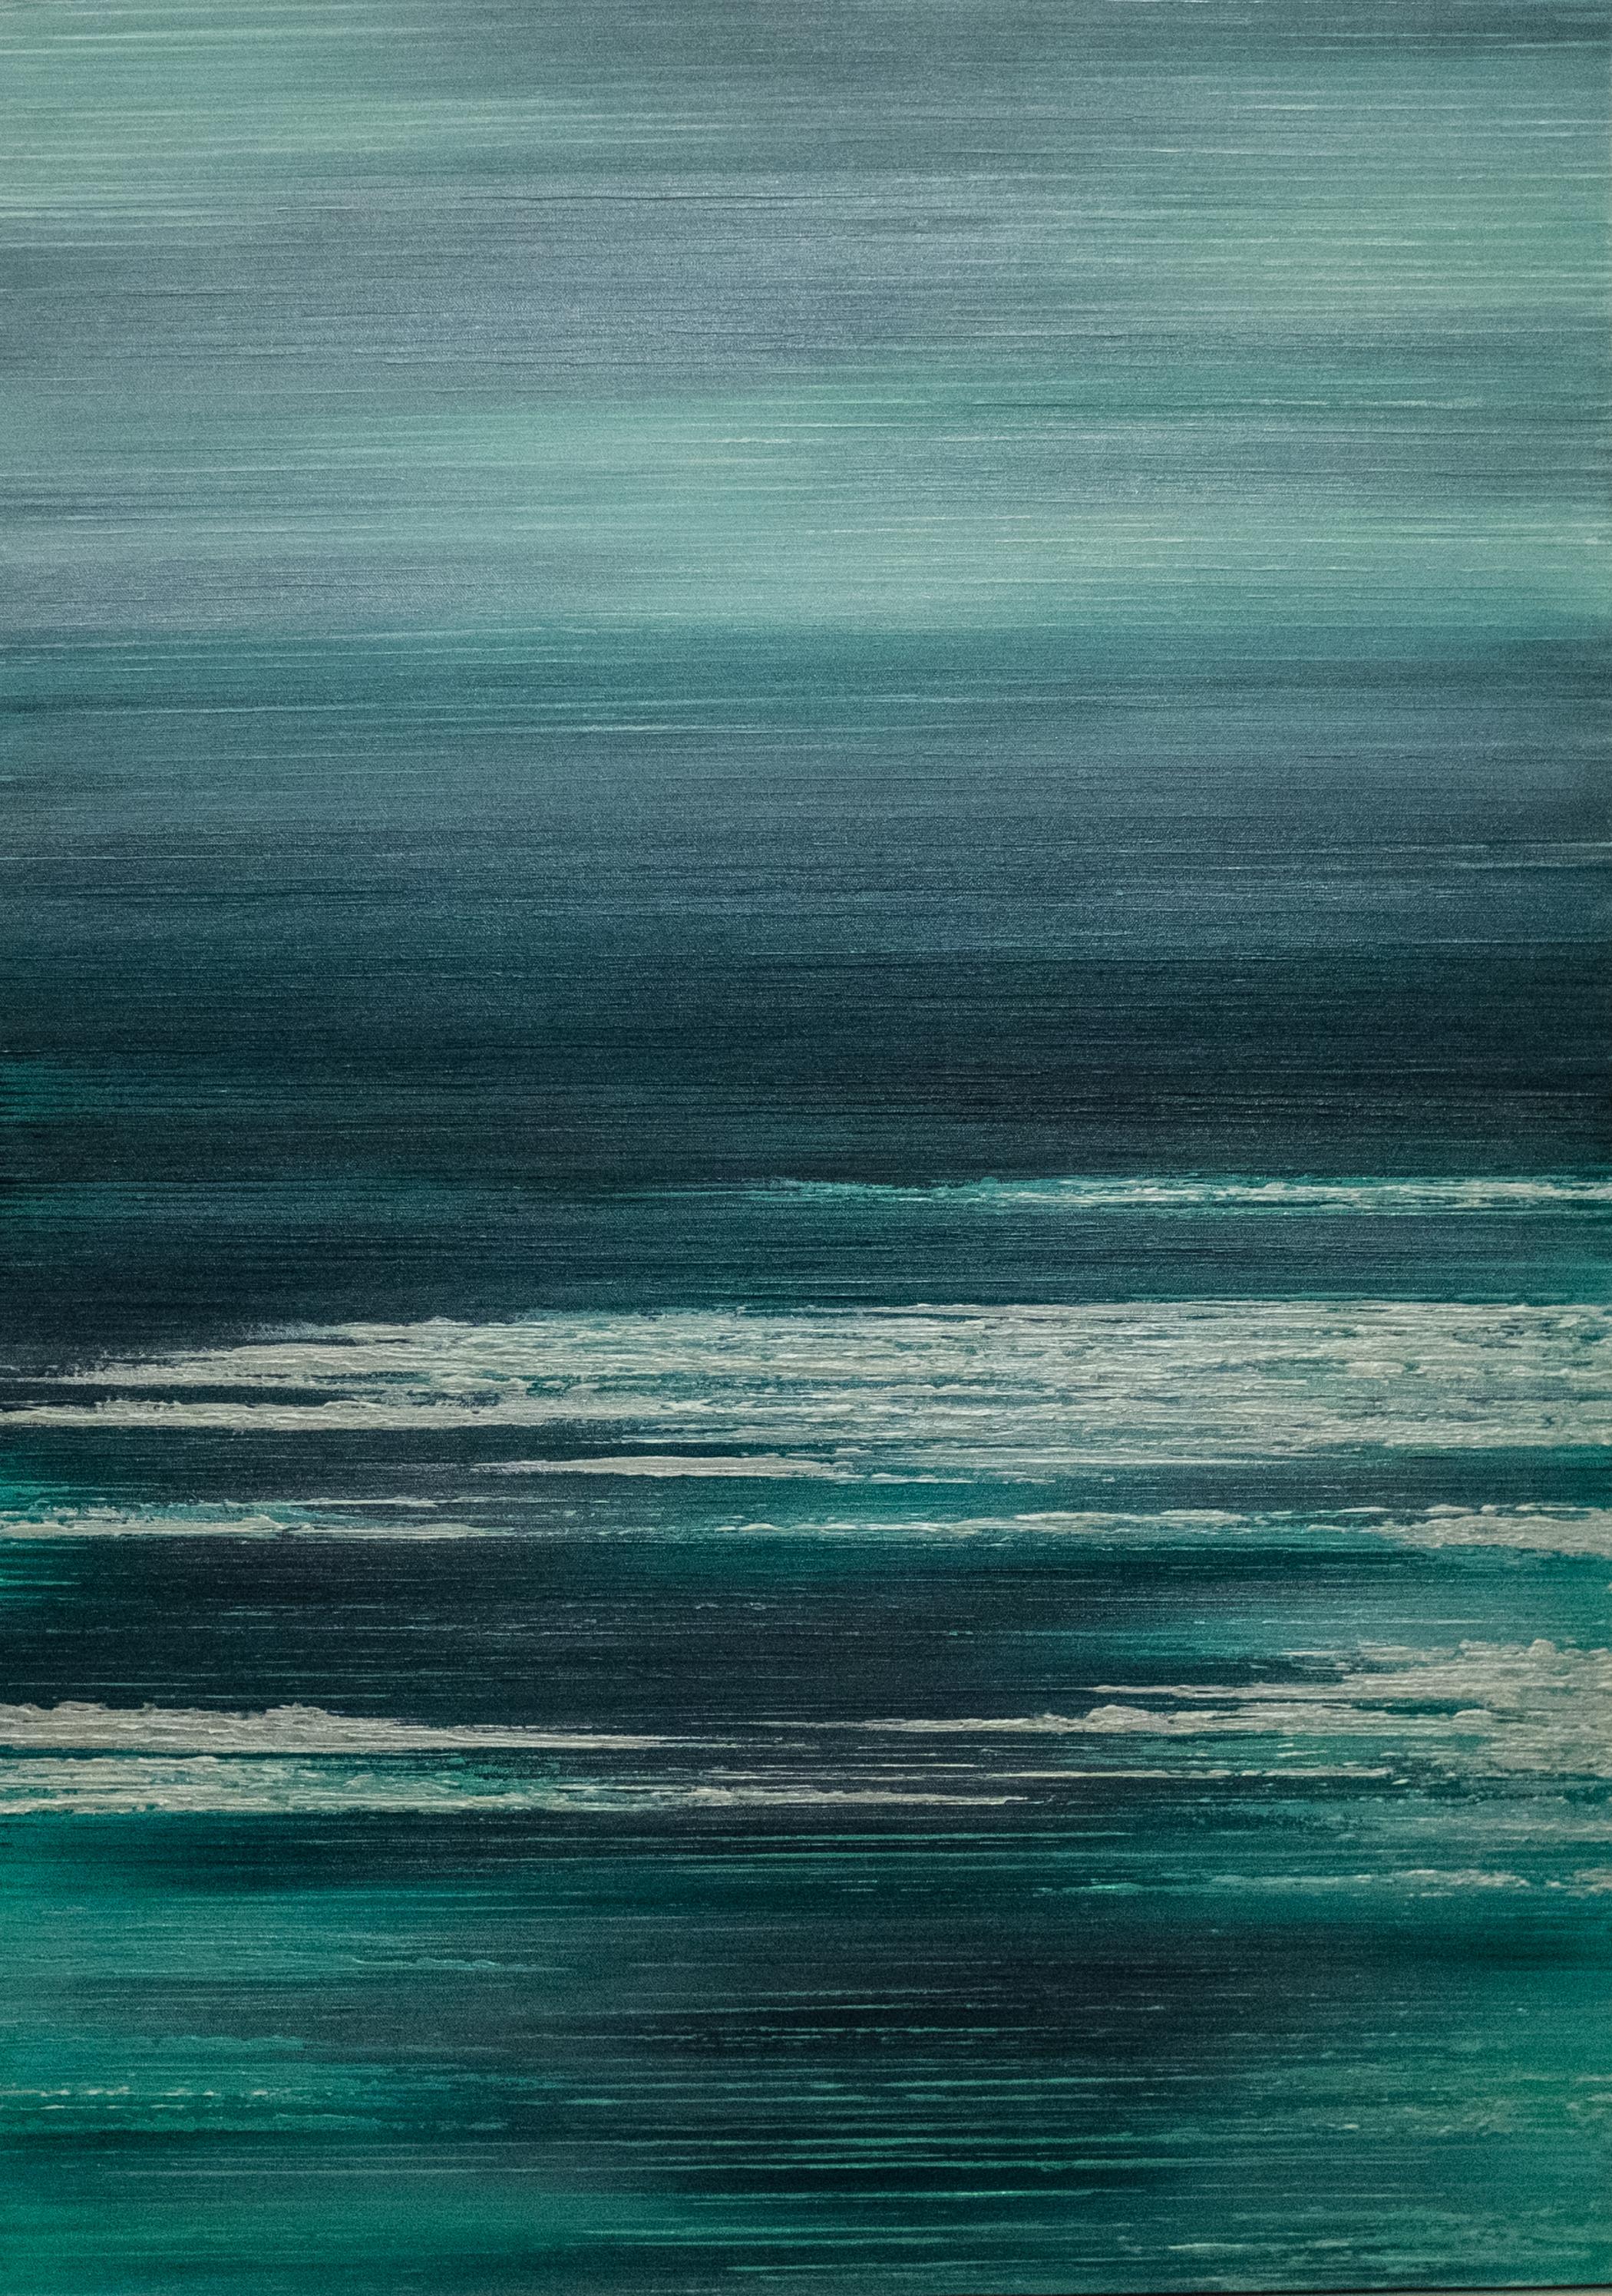 Seascape III - Sea Green/White - 2015